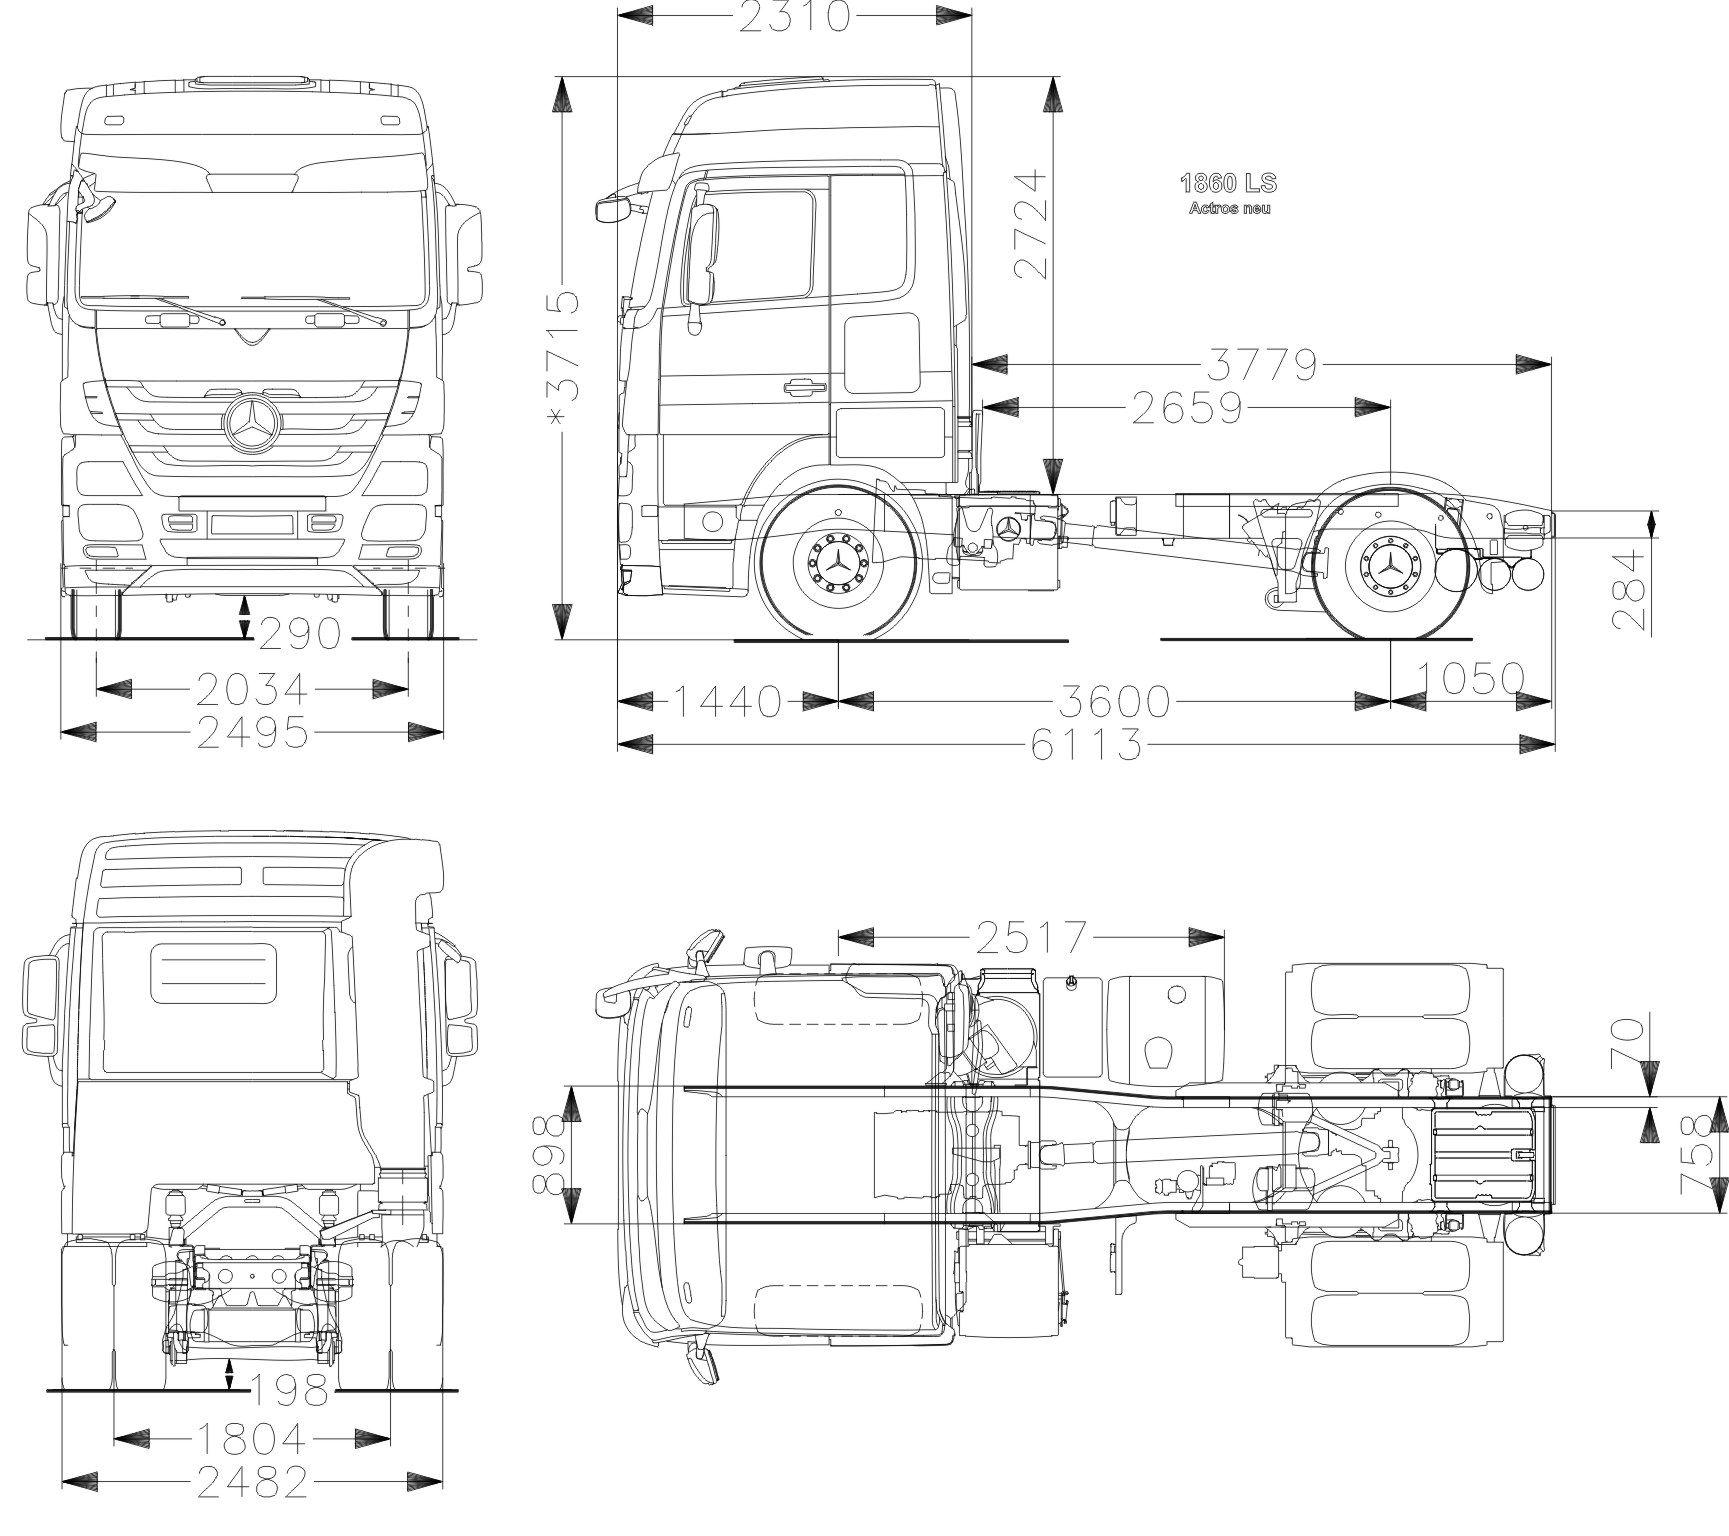 Mercedes Benz Actros Truck Transmisssion   Wiring Diagram Database